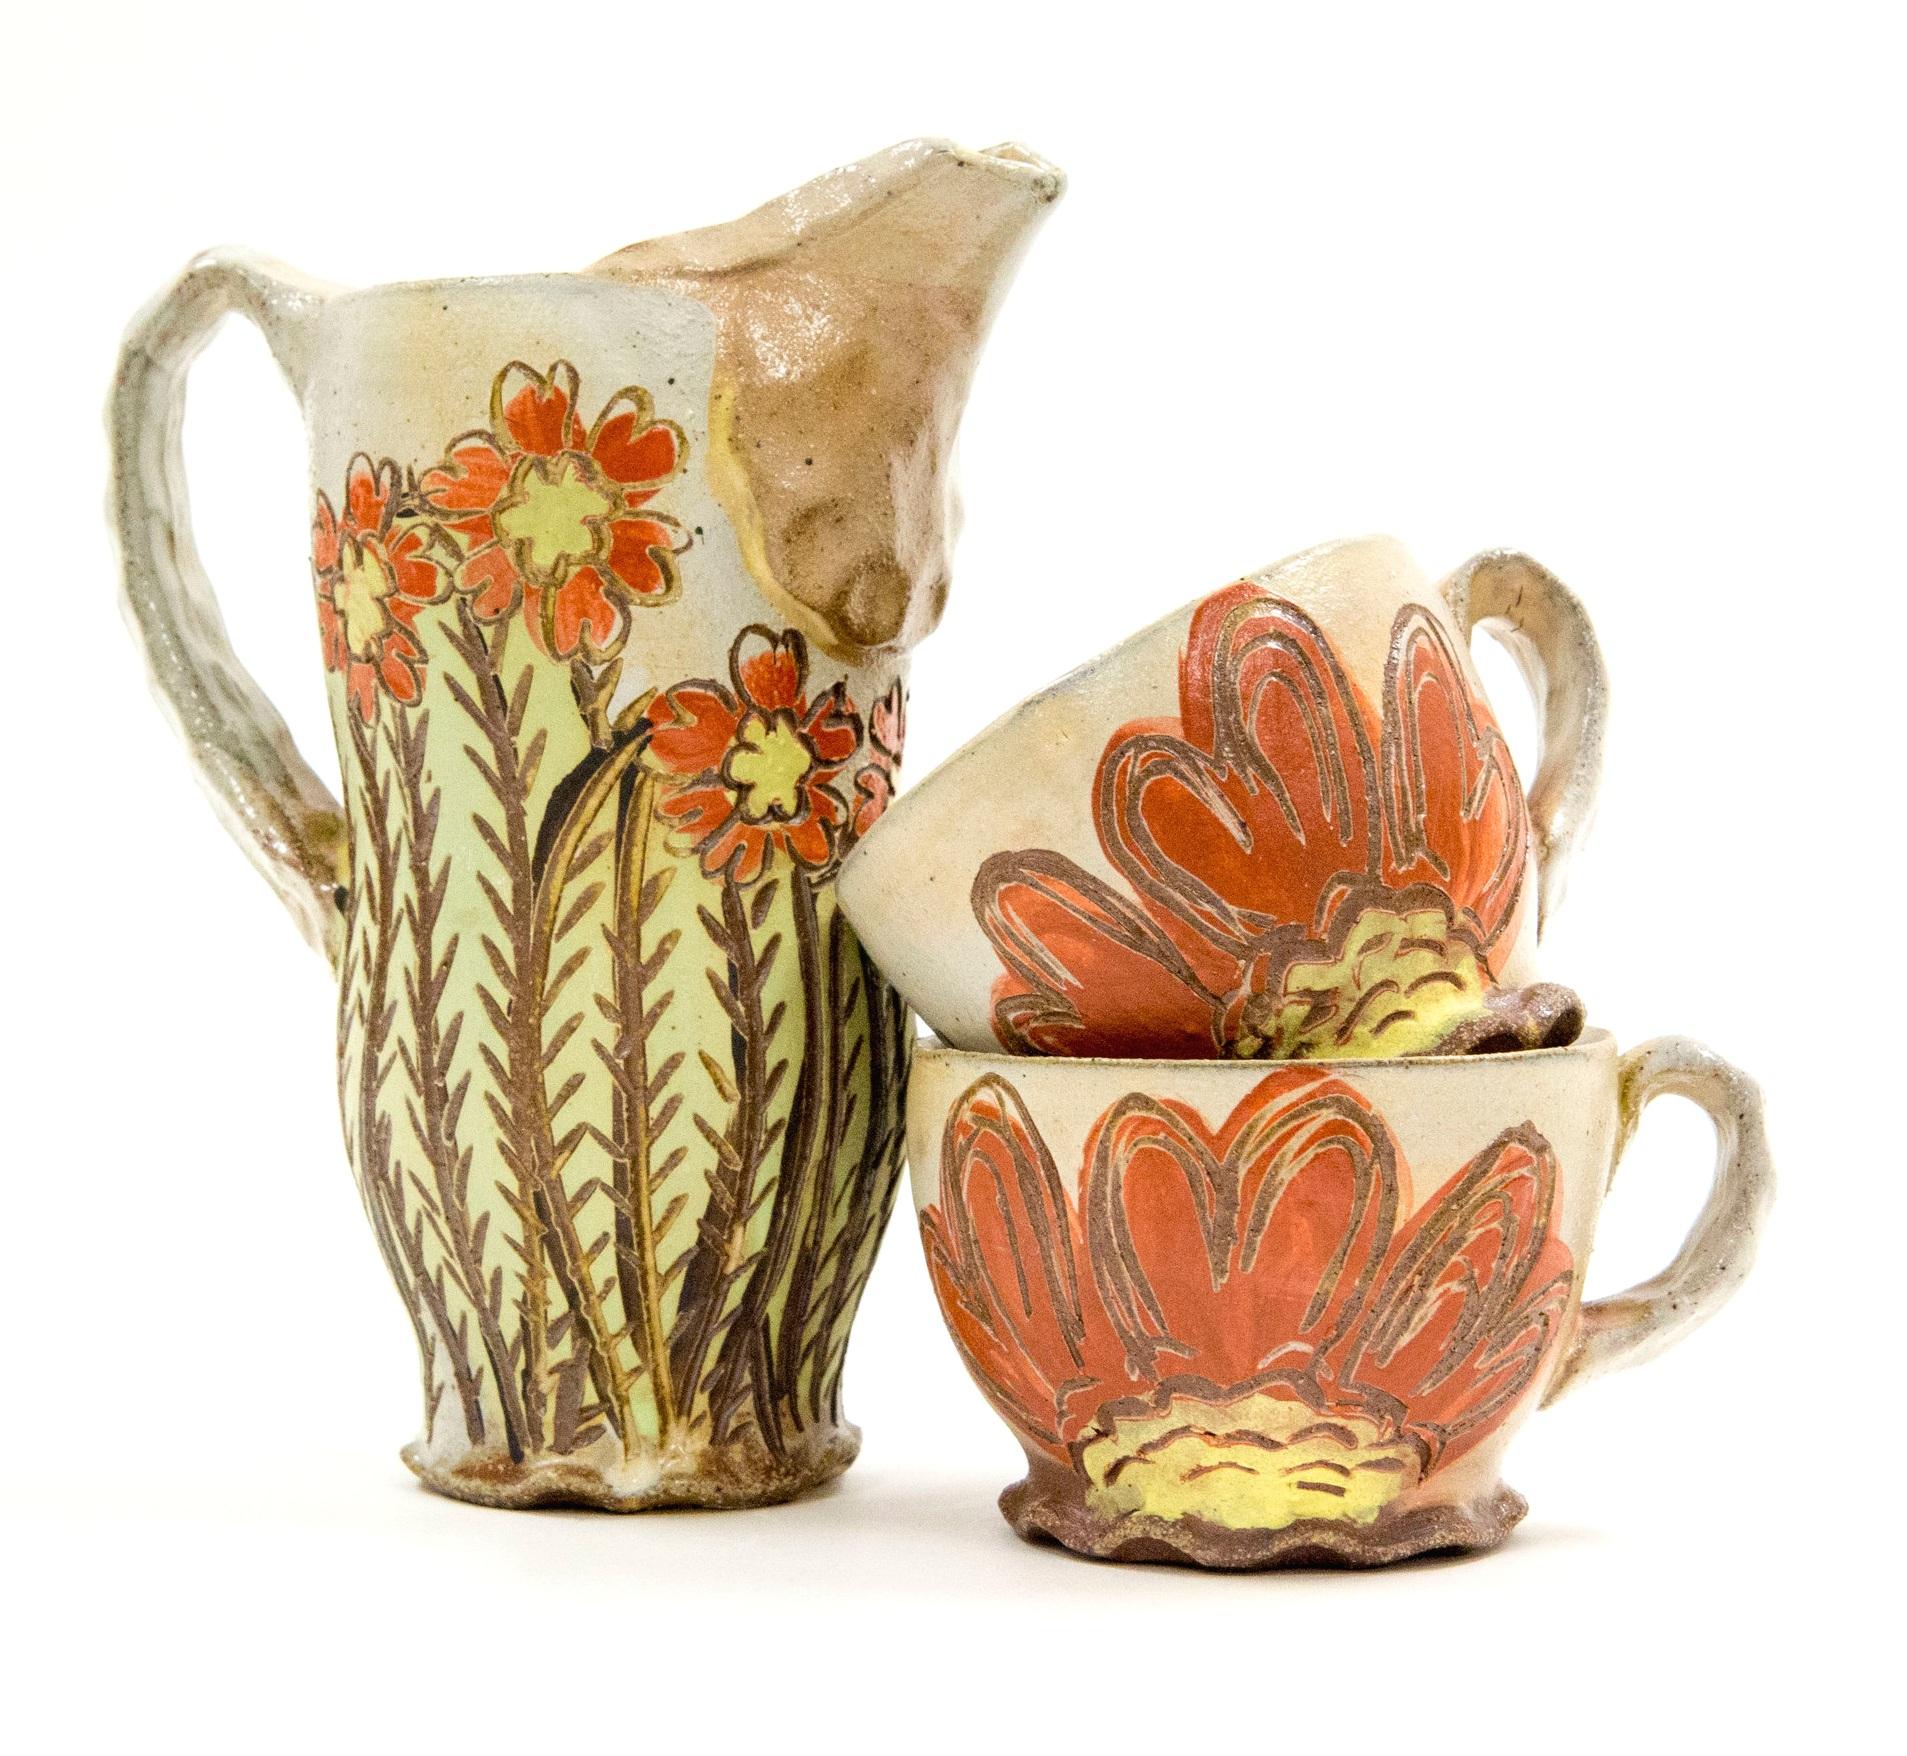 Cacti Set, Brown Stoneware, Δ6 Reduction Salt-Fired, 2017